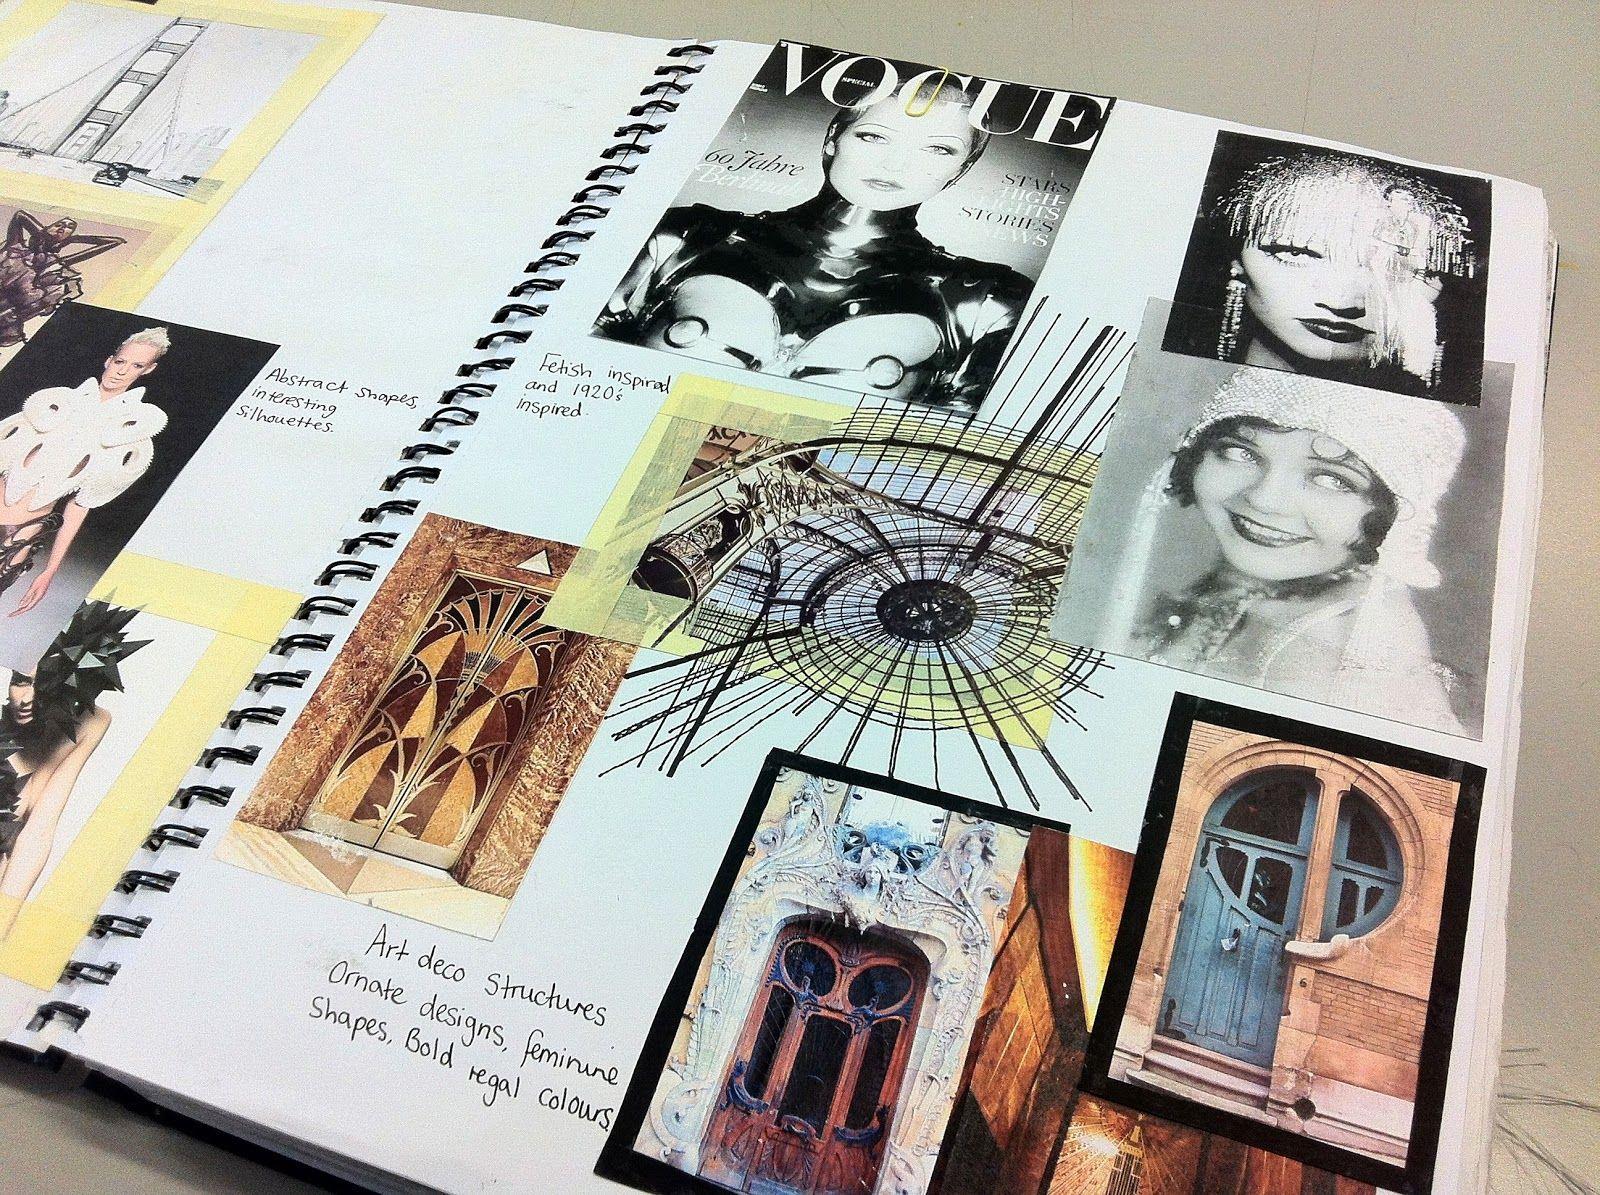 Fashion Design Sketchbook - art deco inspirations from buildings and  architecture (via littlevioletribbon.blogspot.co.uk)